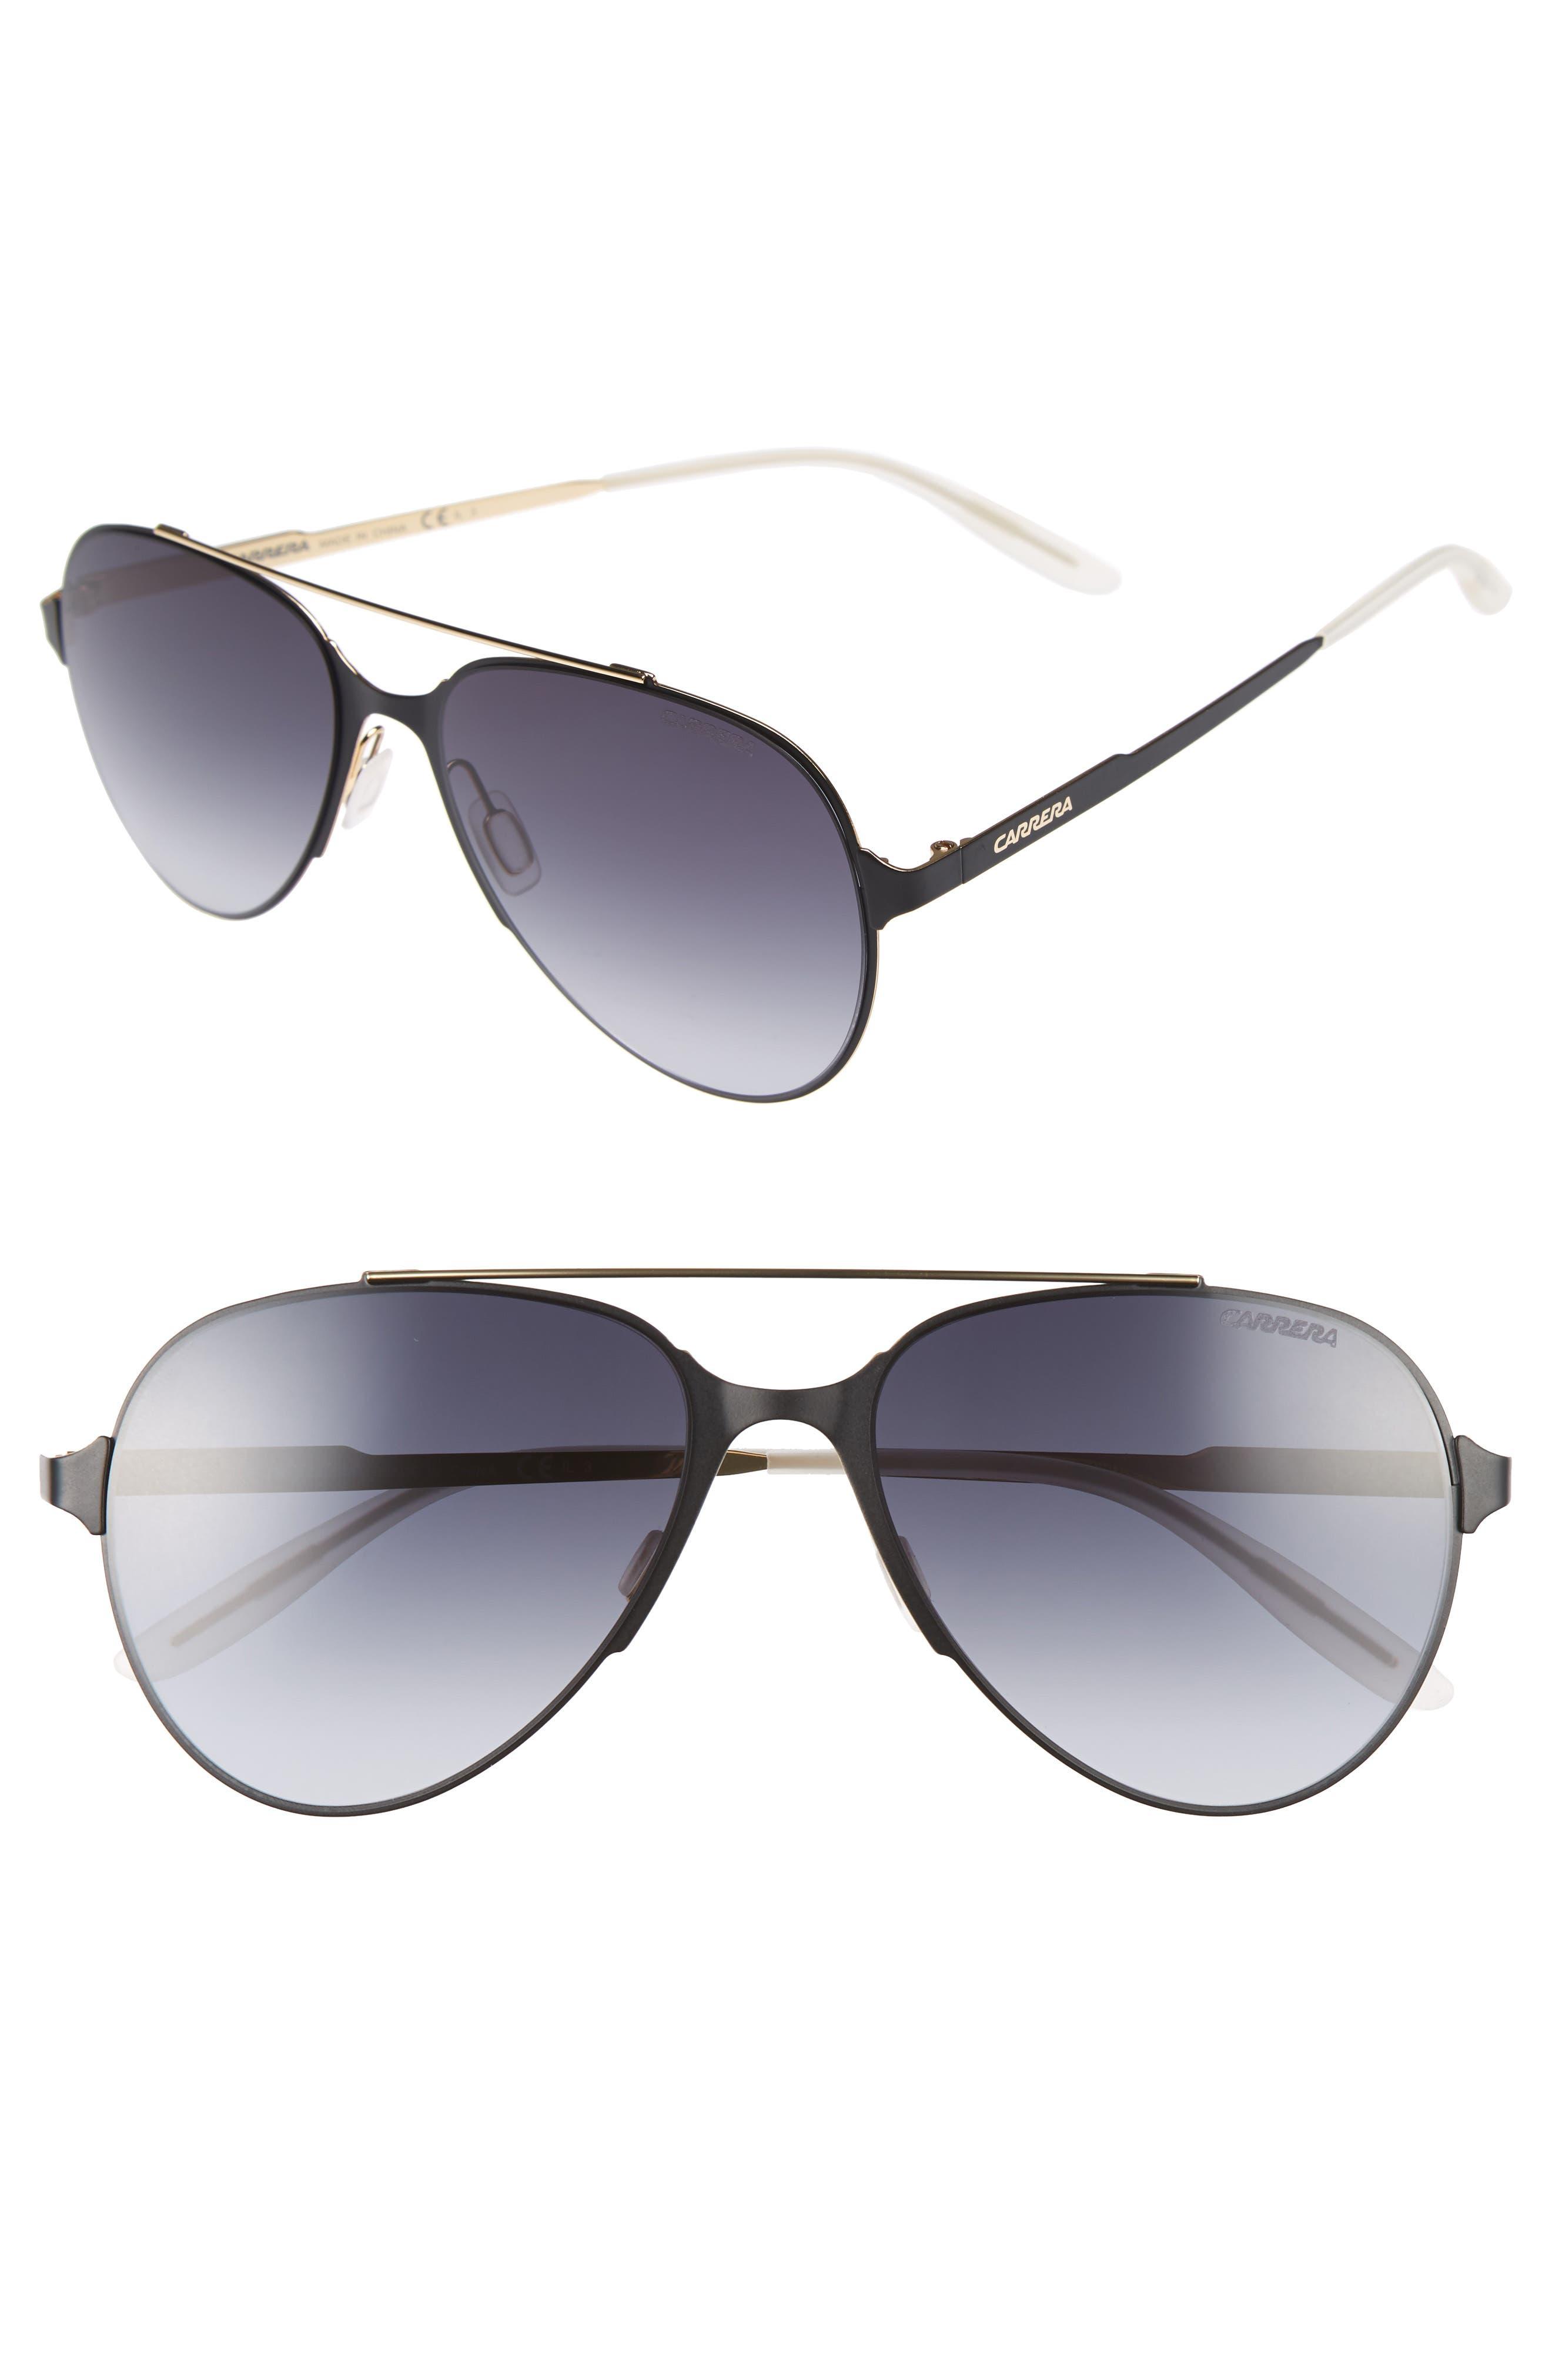 Alternate Image 1 Selected - Carrera Eyewear 55mm Aviator Sunglasses